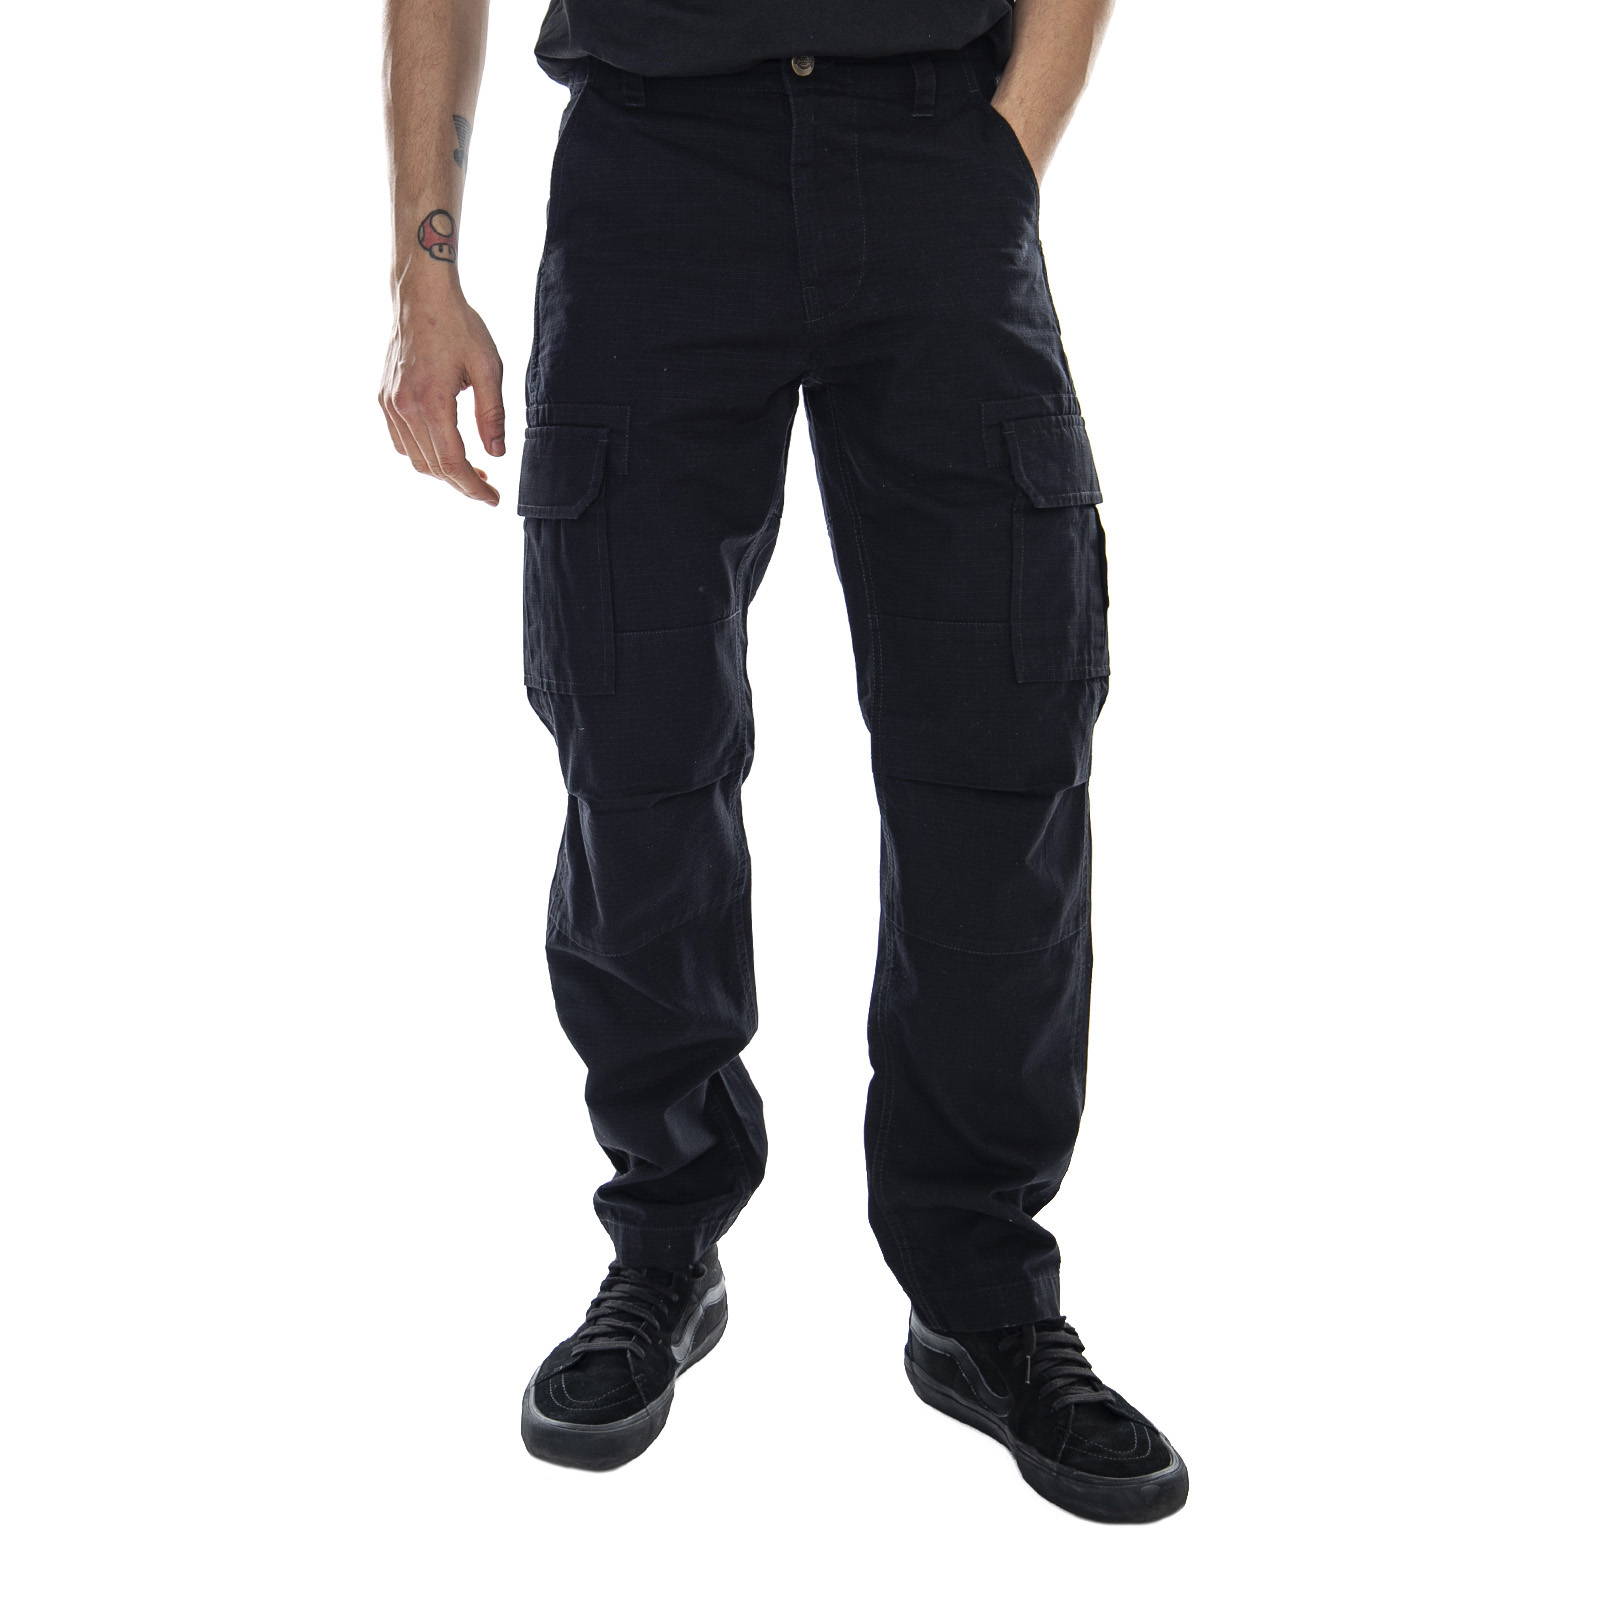 cosa succo Sperimentare  Dickies Edward Sport Pant - Black - Pantaloni Cargo Uomo Nero | eBay